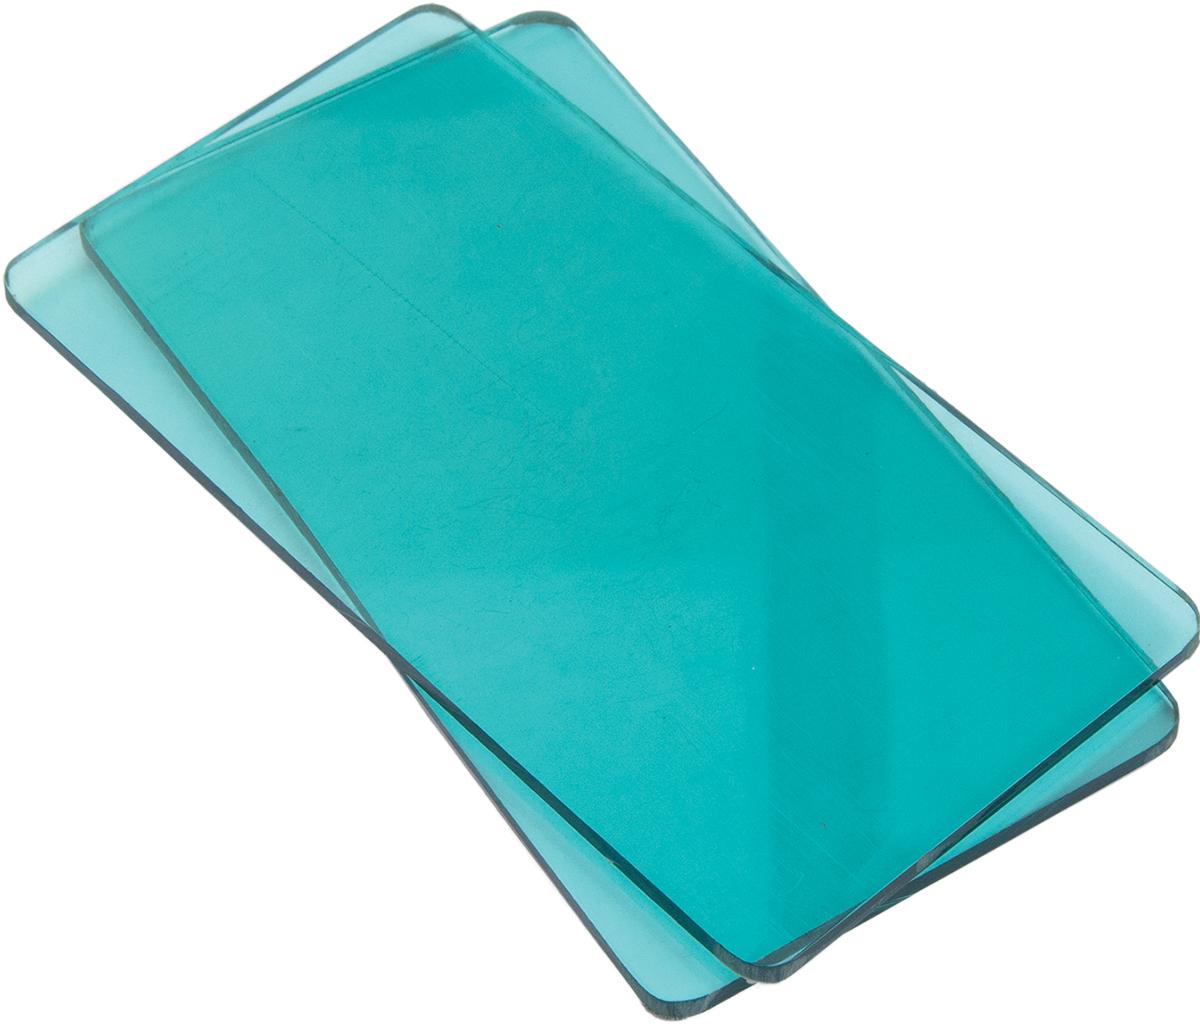 Sizzix Sidekick Cutting Pads 1 Pair-Aqua